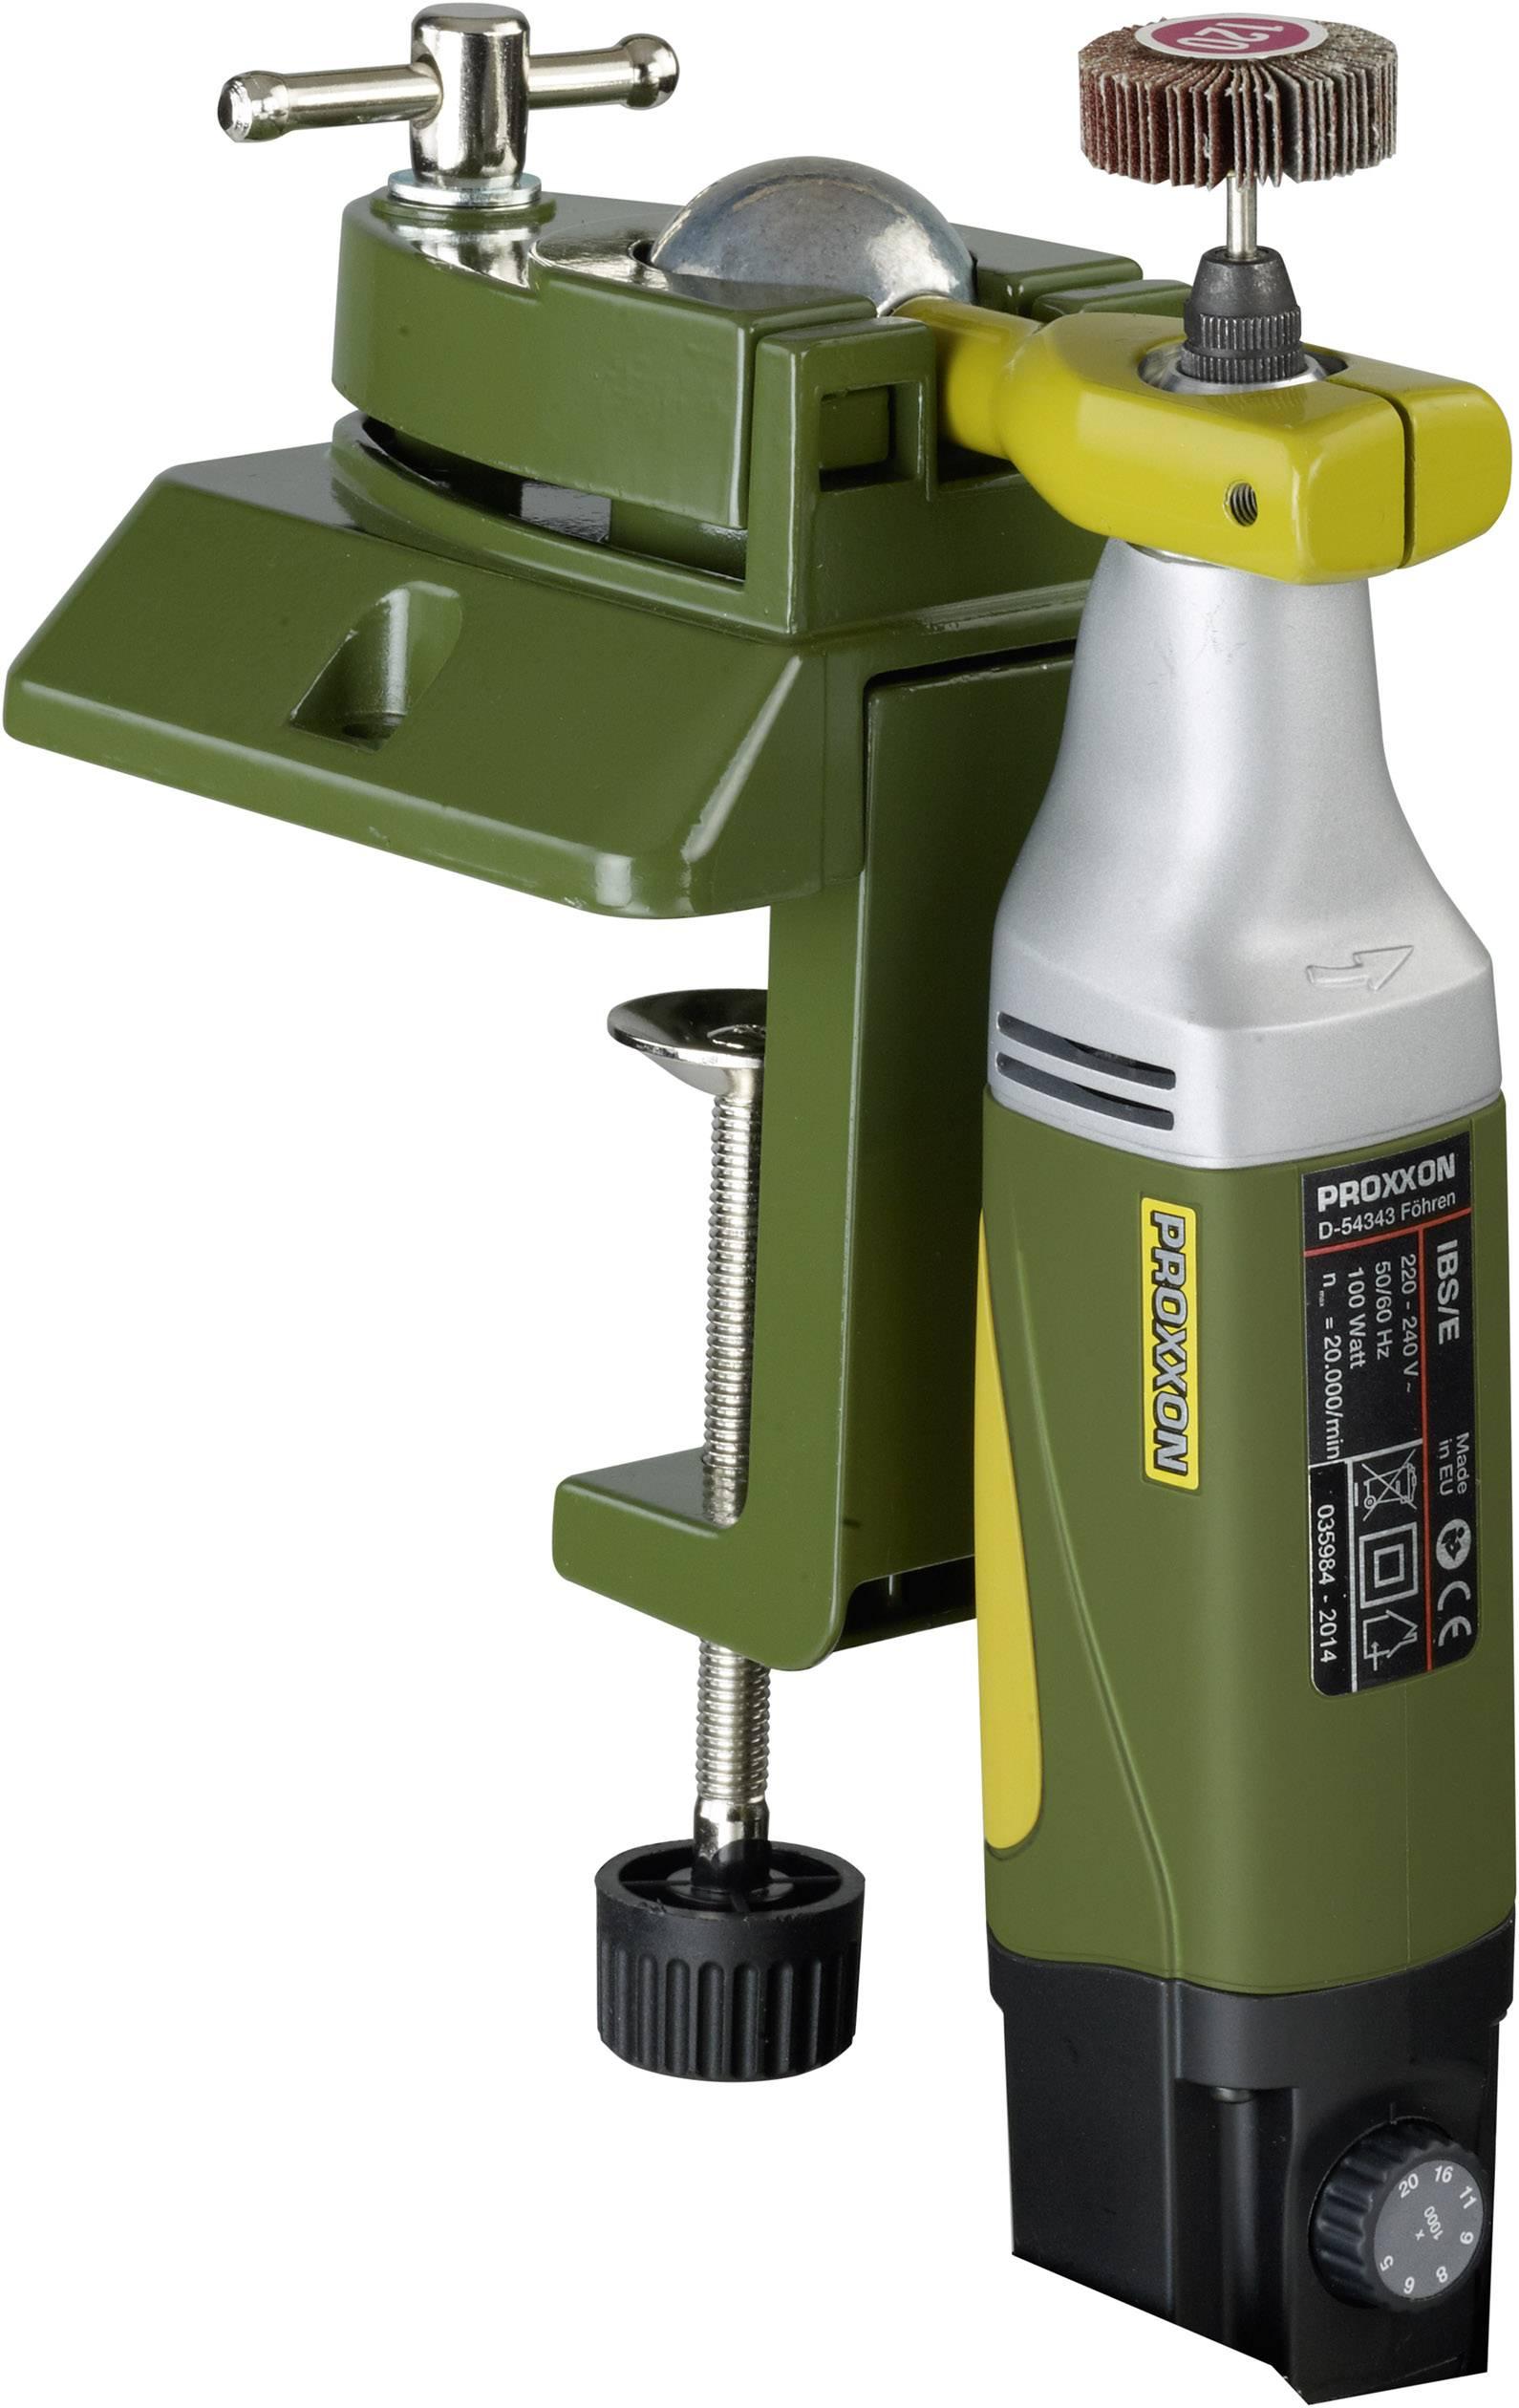 Proxxon Micromot UHZ 28 610